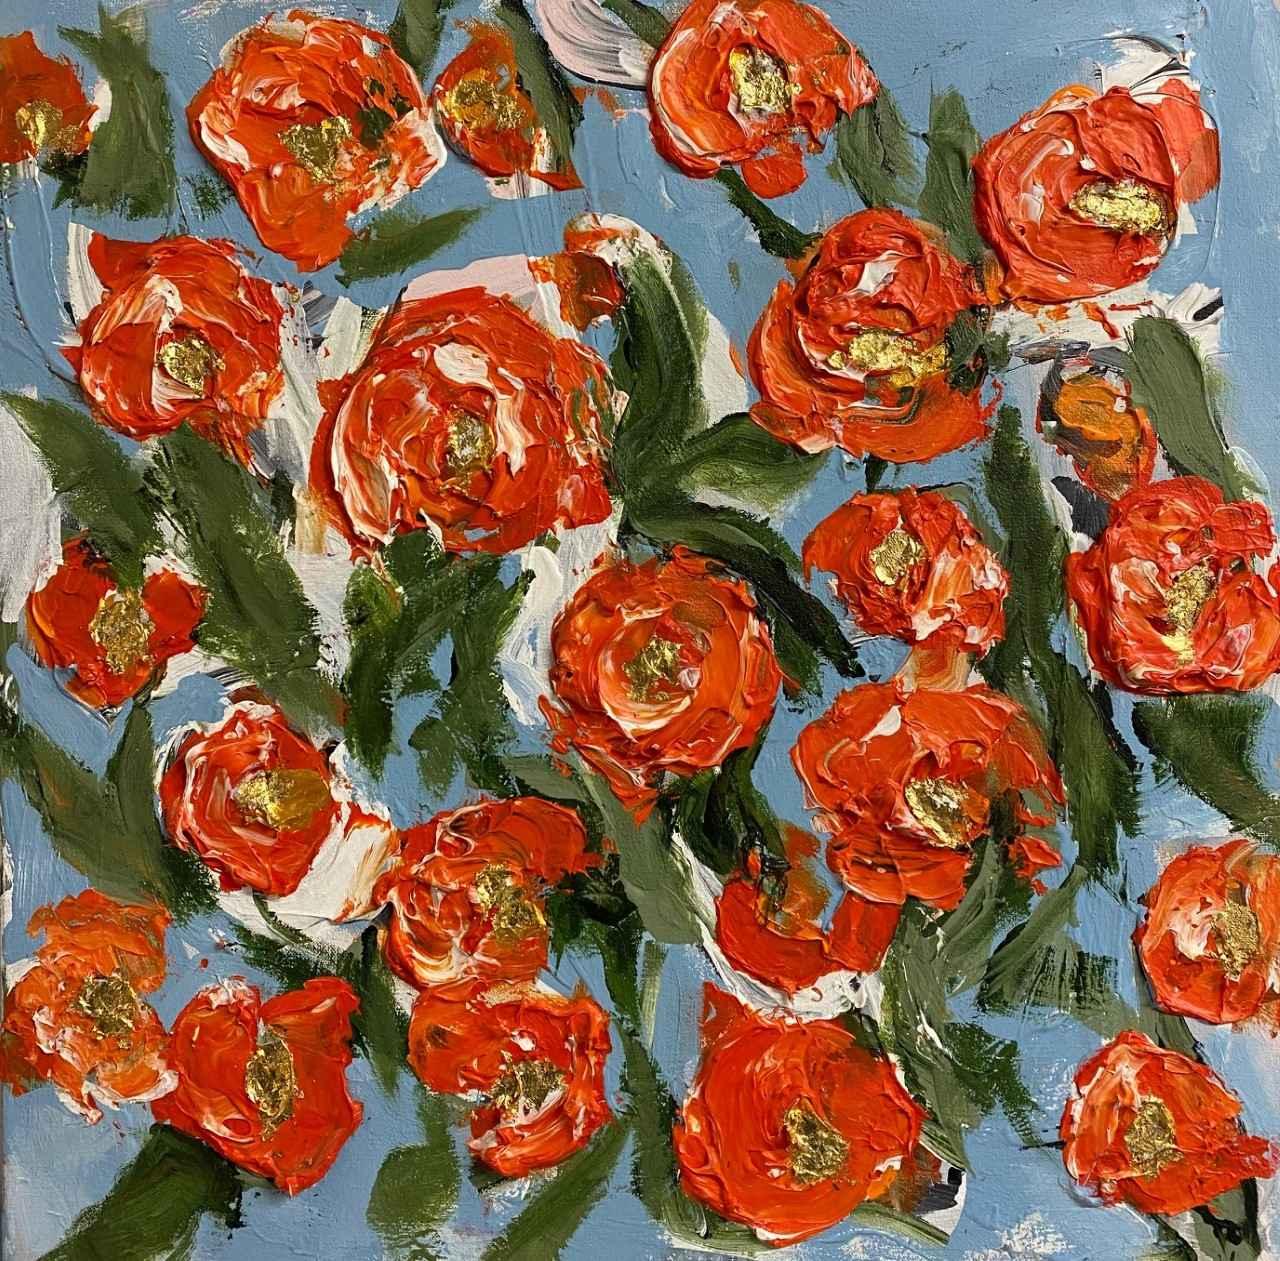 Garden of Ranunculus ... by  Steve Lyons - Masterpiece Online